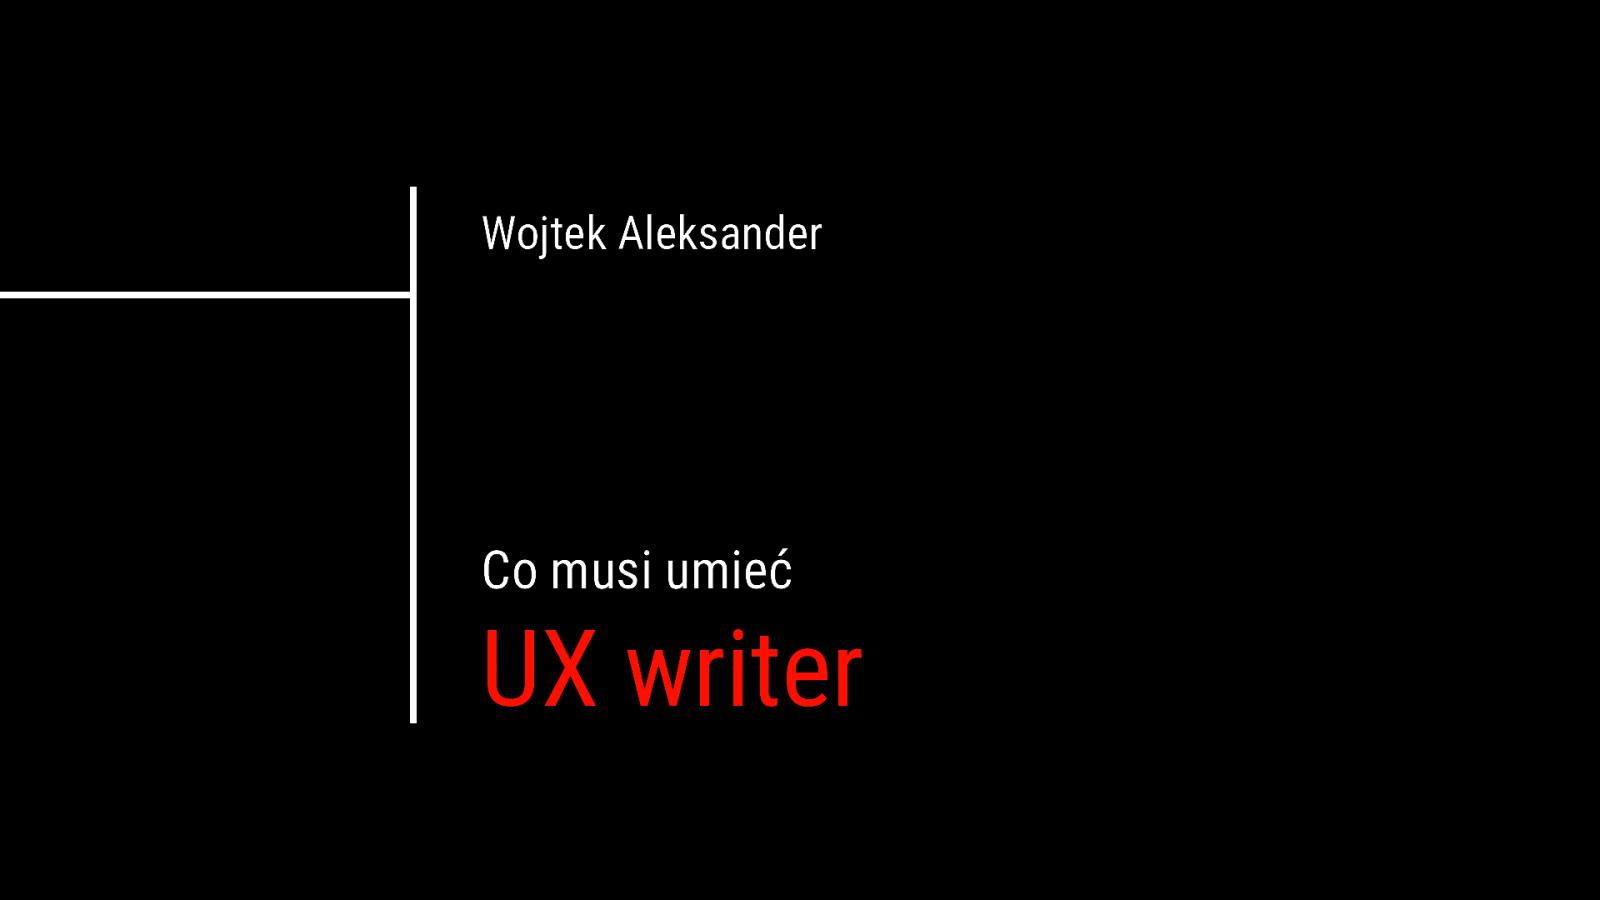 Co musi umieć UX writer?